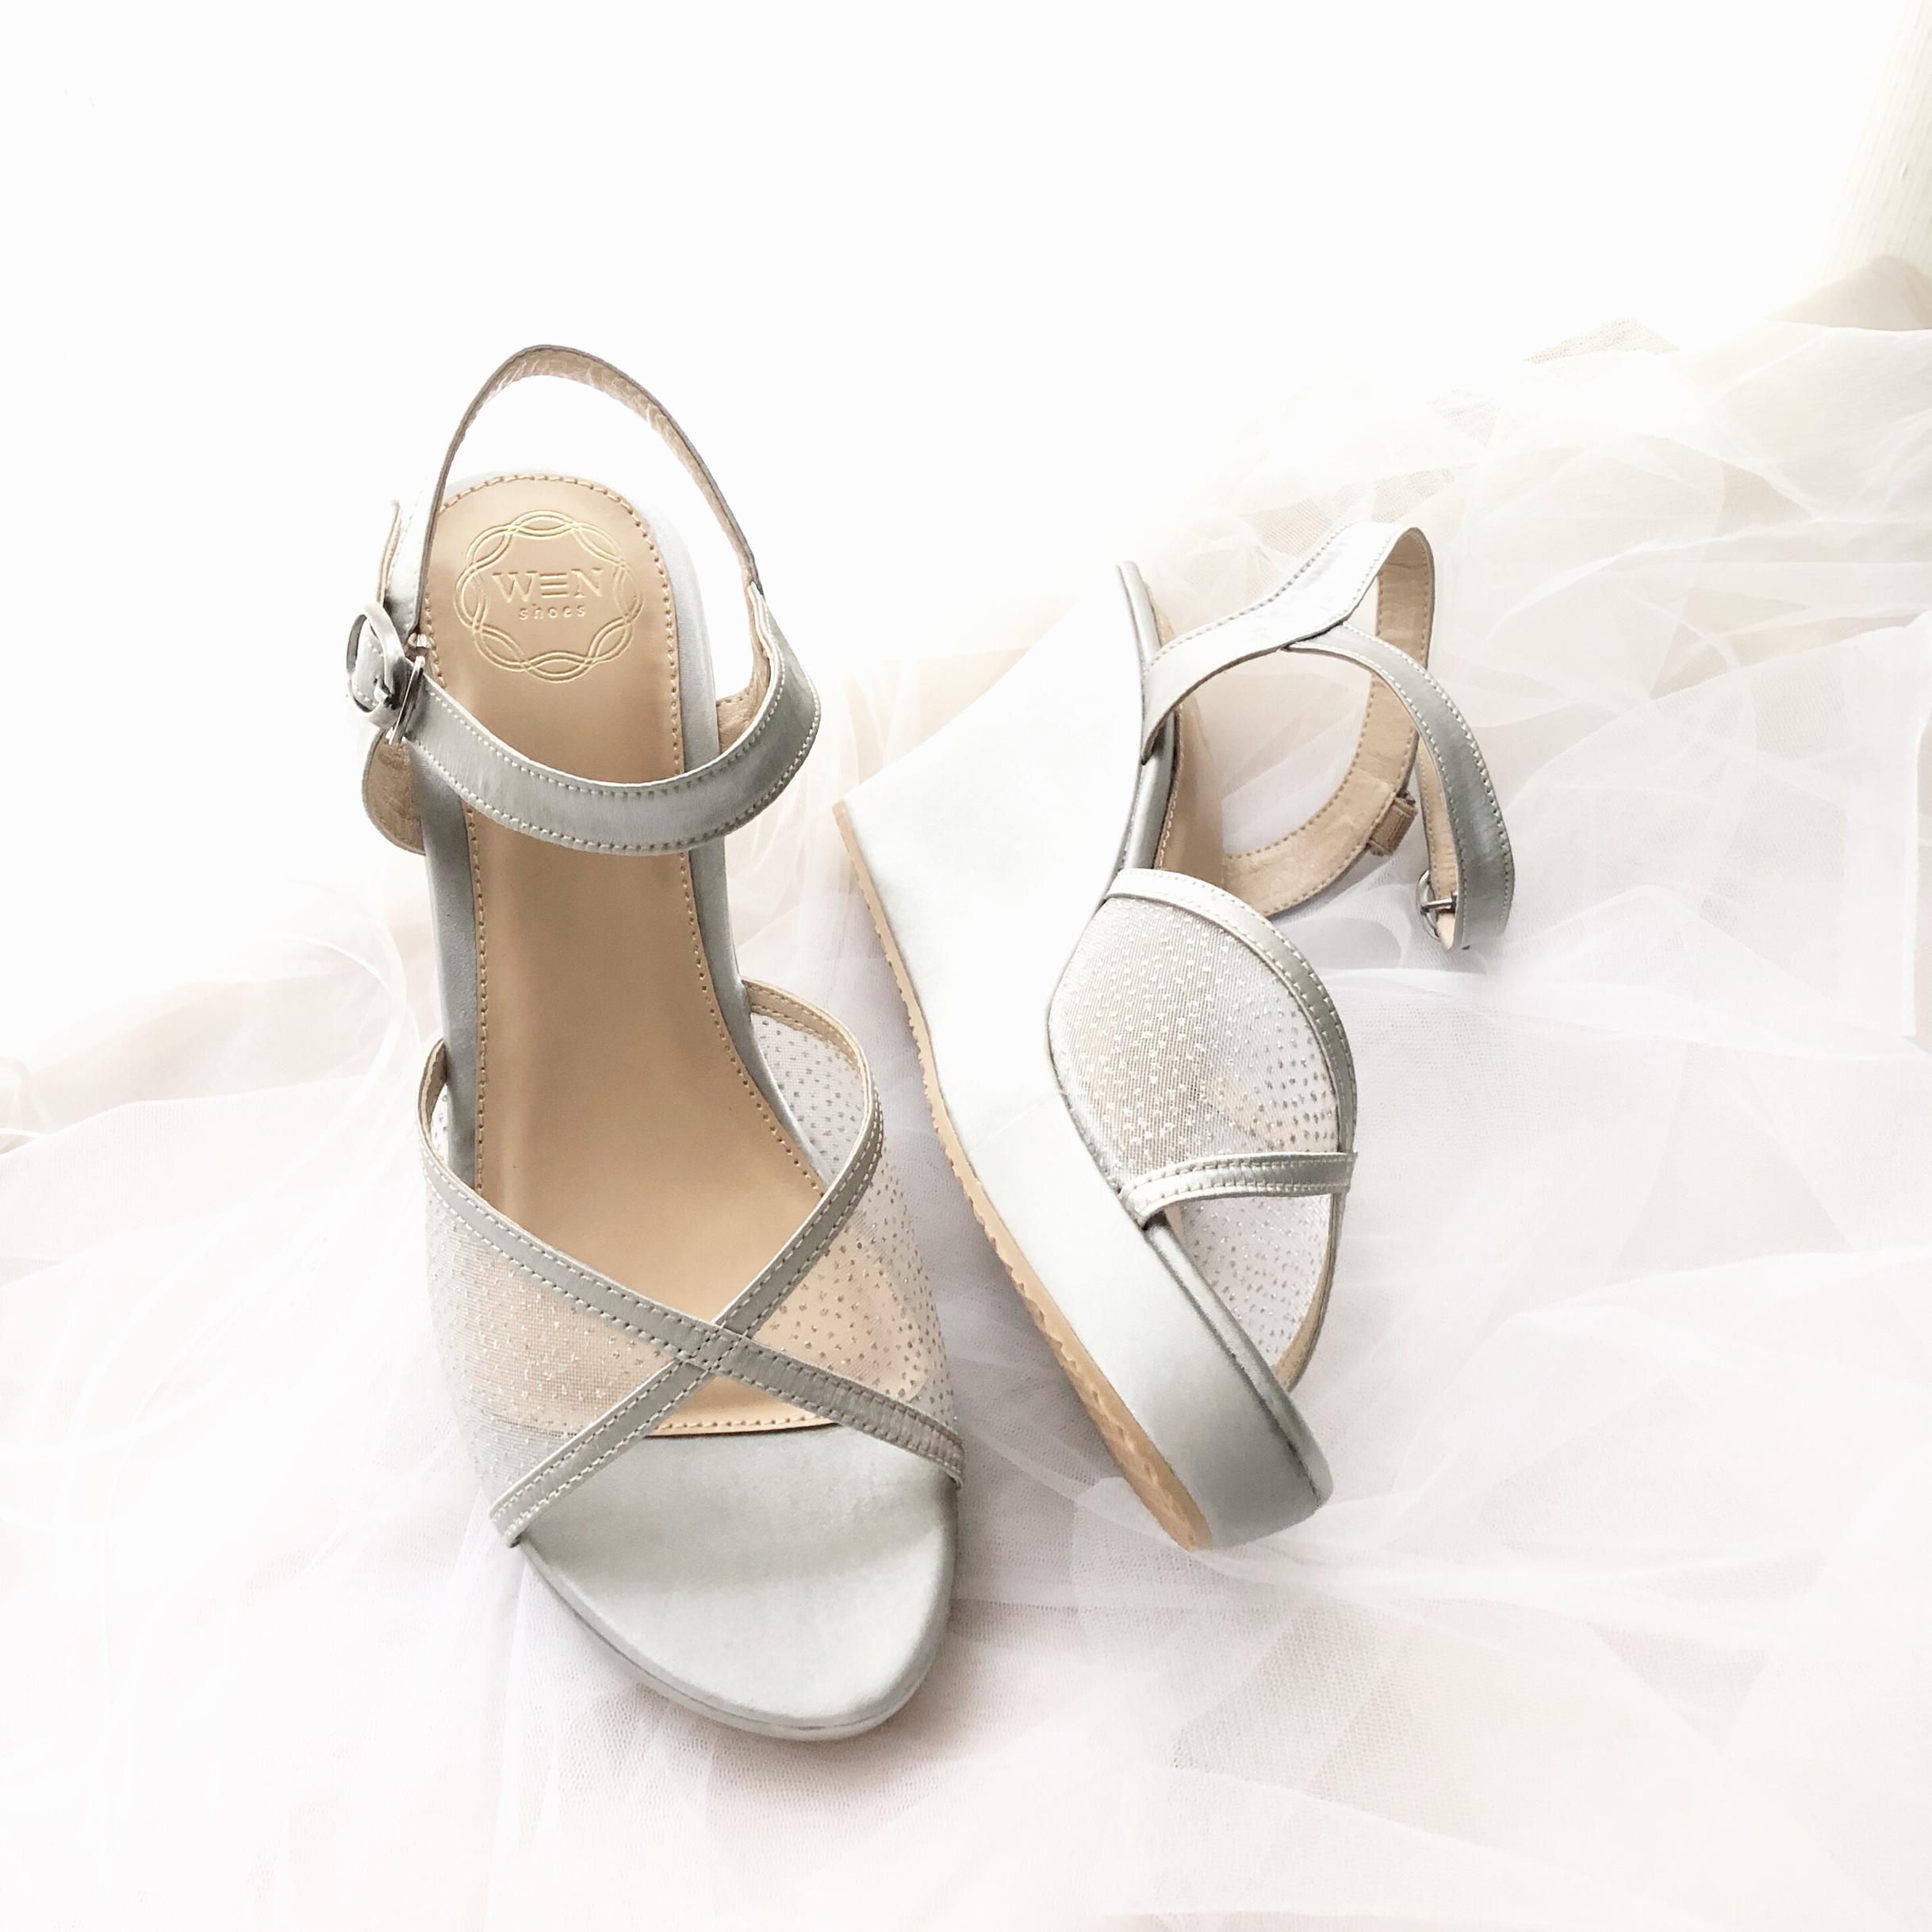 b4ea424f0be Pointy heels  wedges  flat shoes  platform heels by Wen Custom   Bridal  Shoes